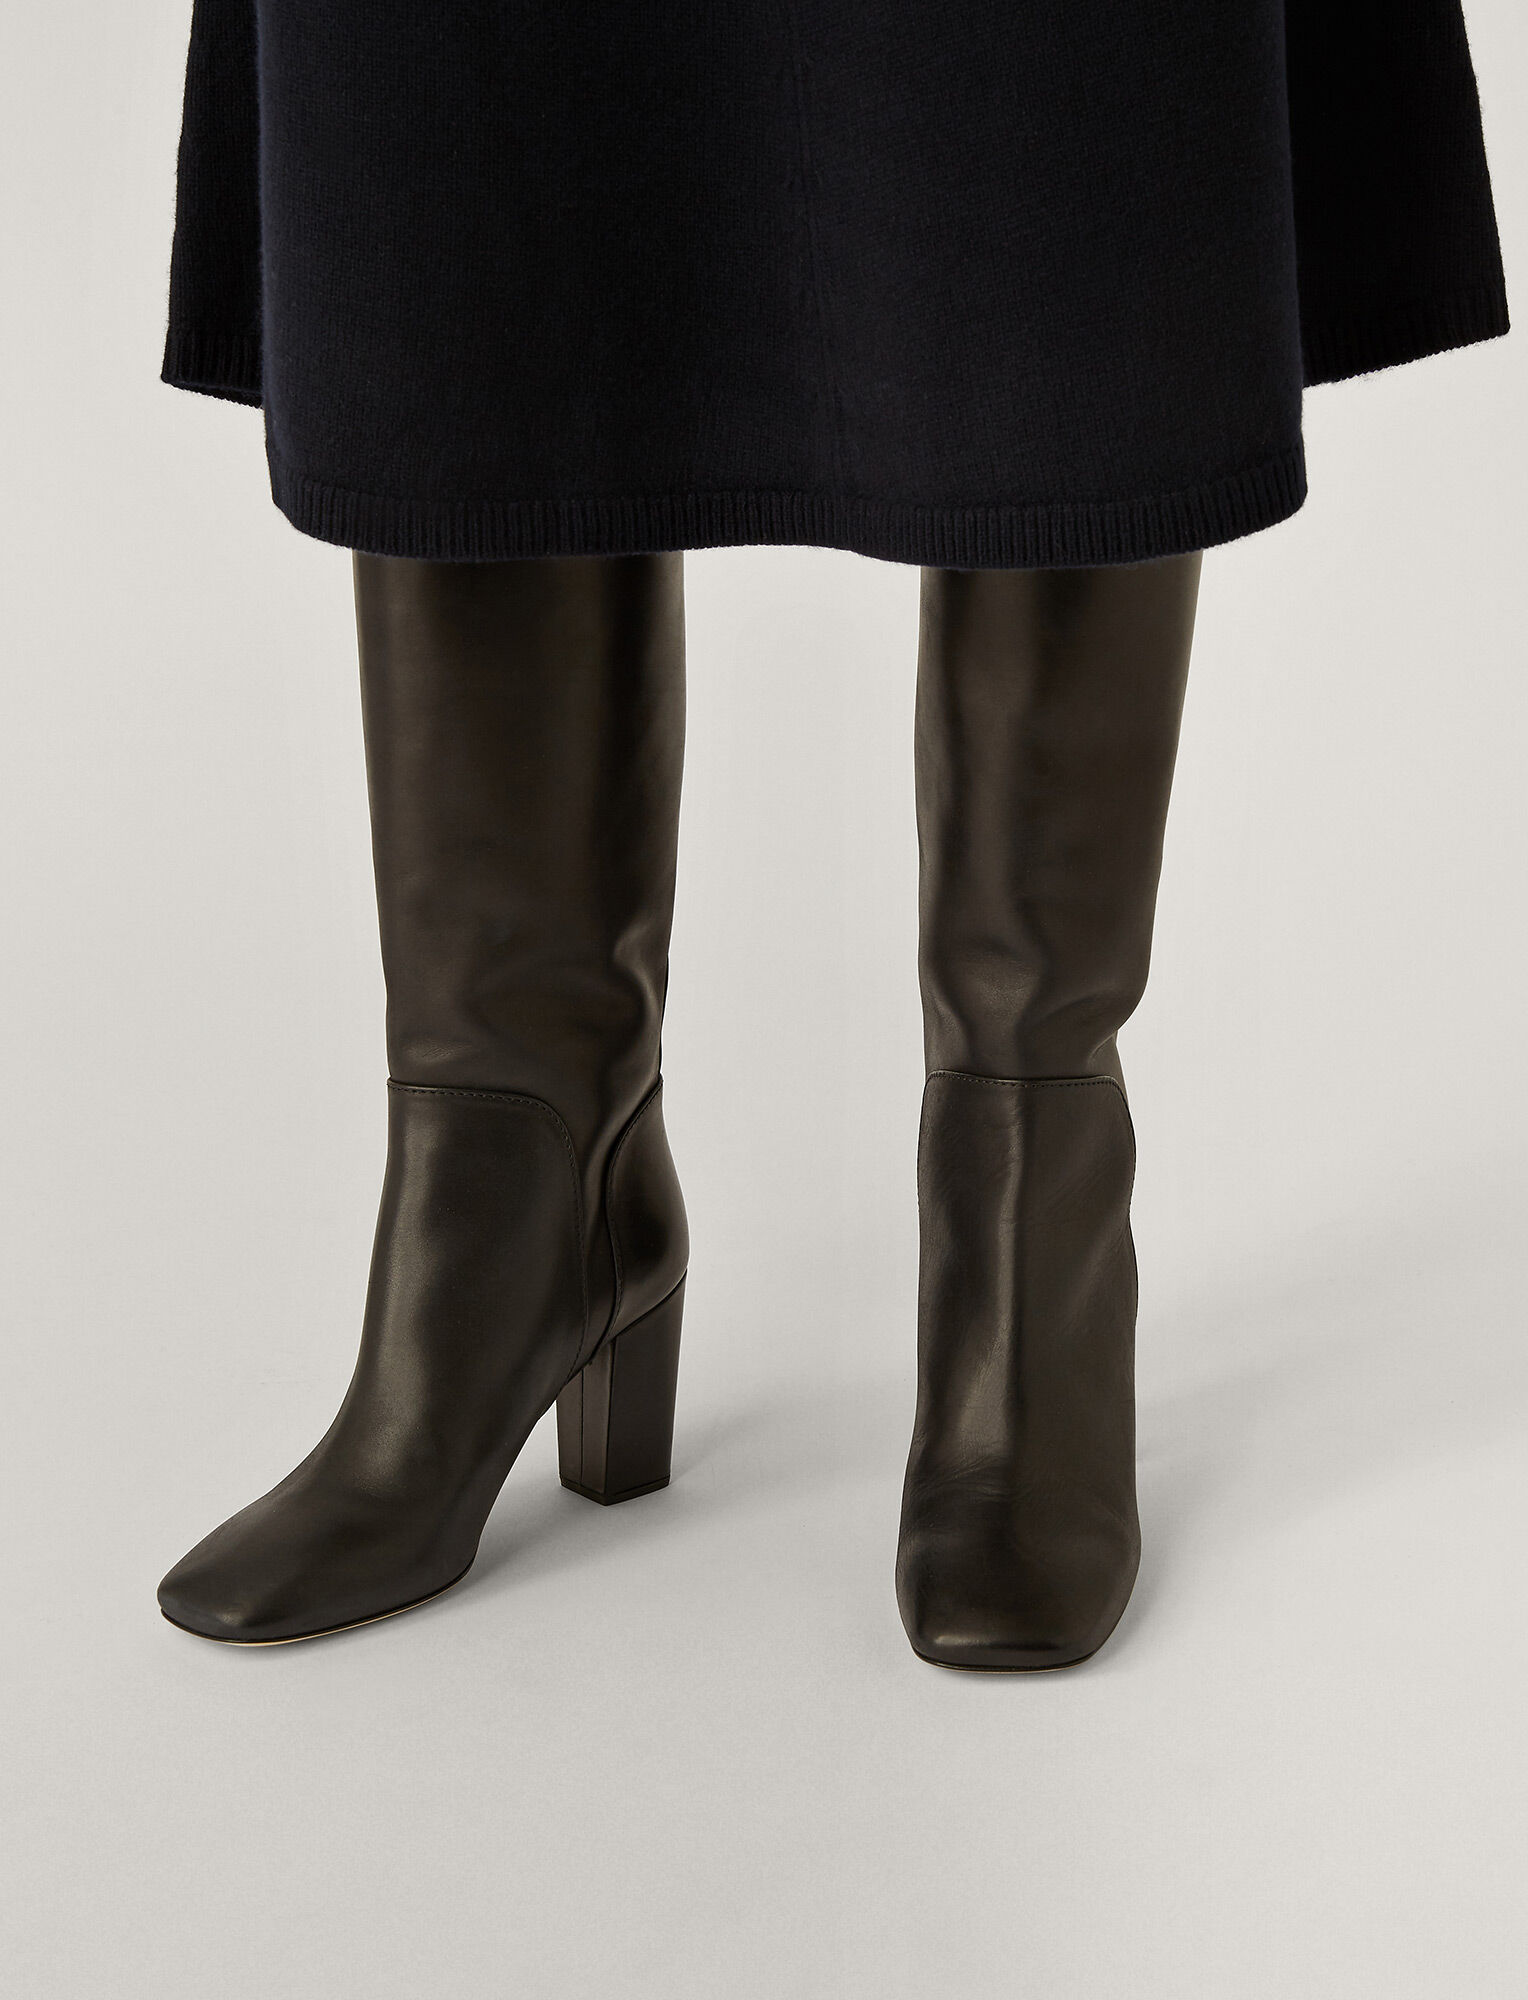 Joseph, Square Heel Long Boots, in Black